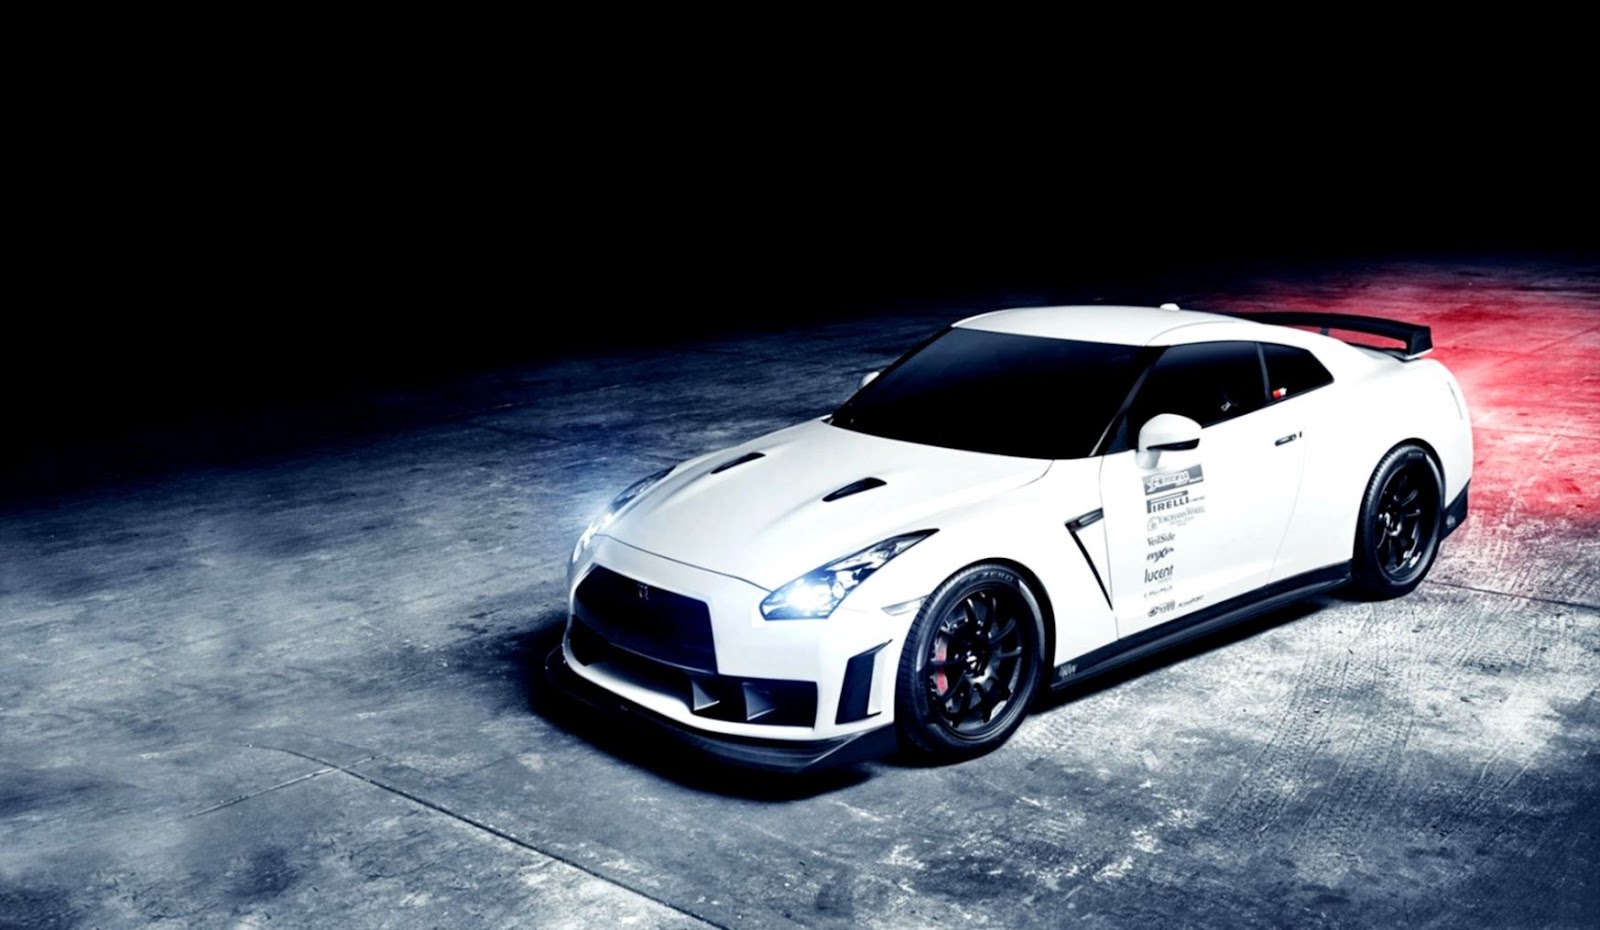 Nissan Gt R Racing Car Hd Wallpaper Opera Wallpapers